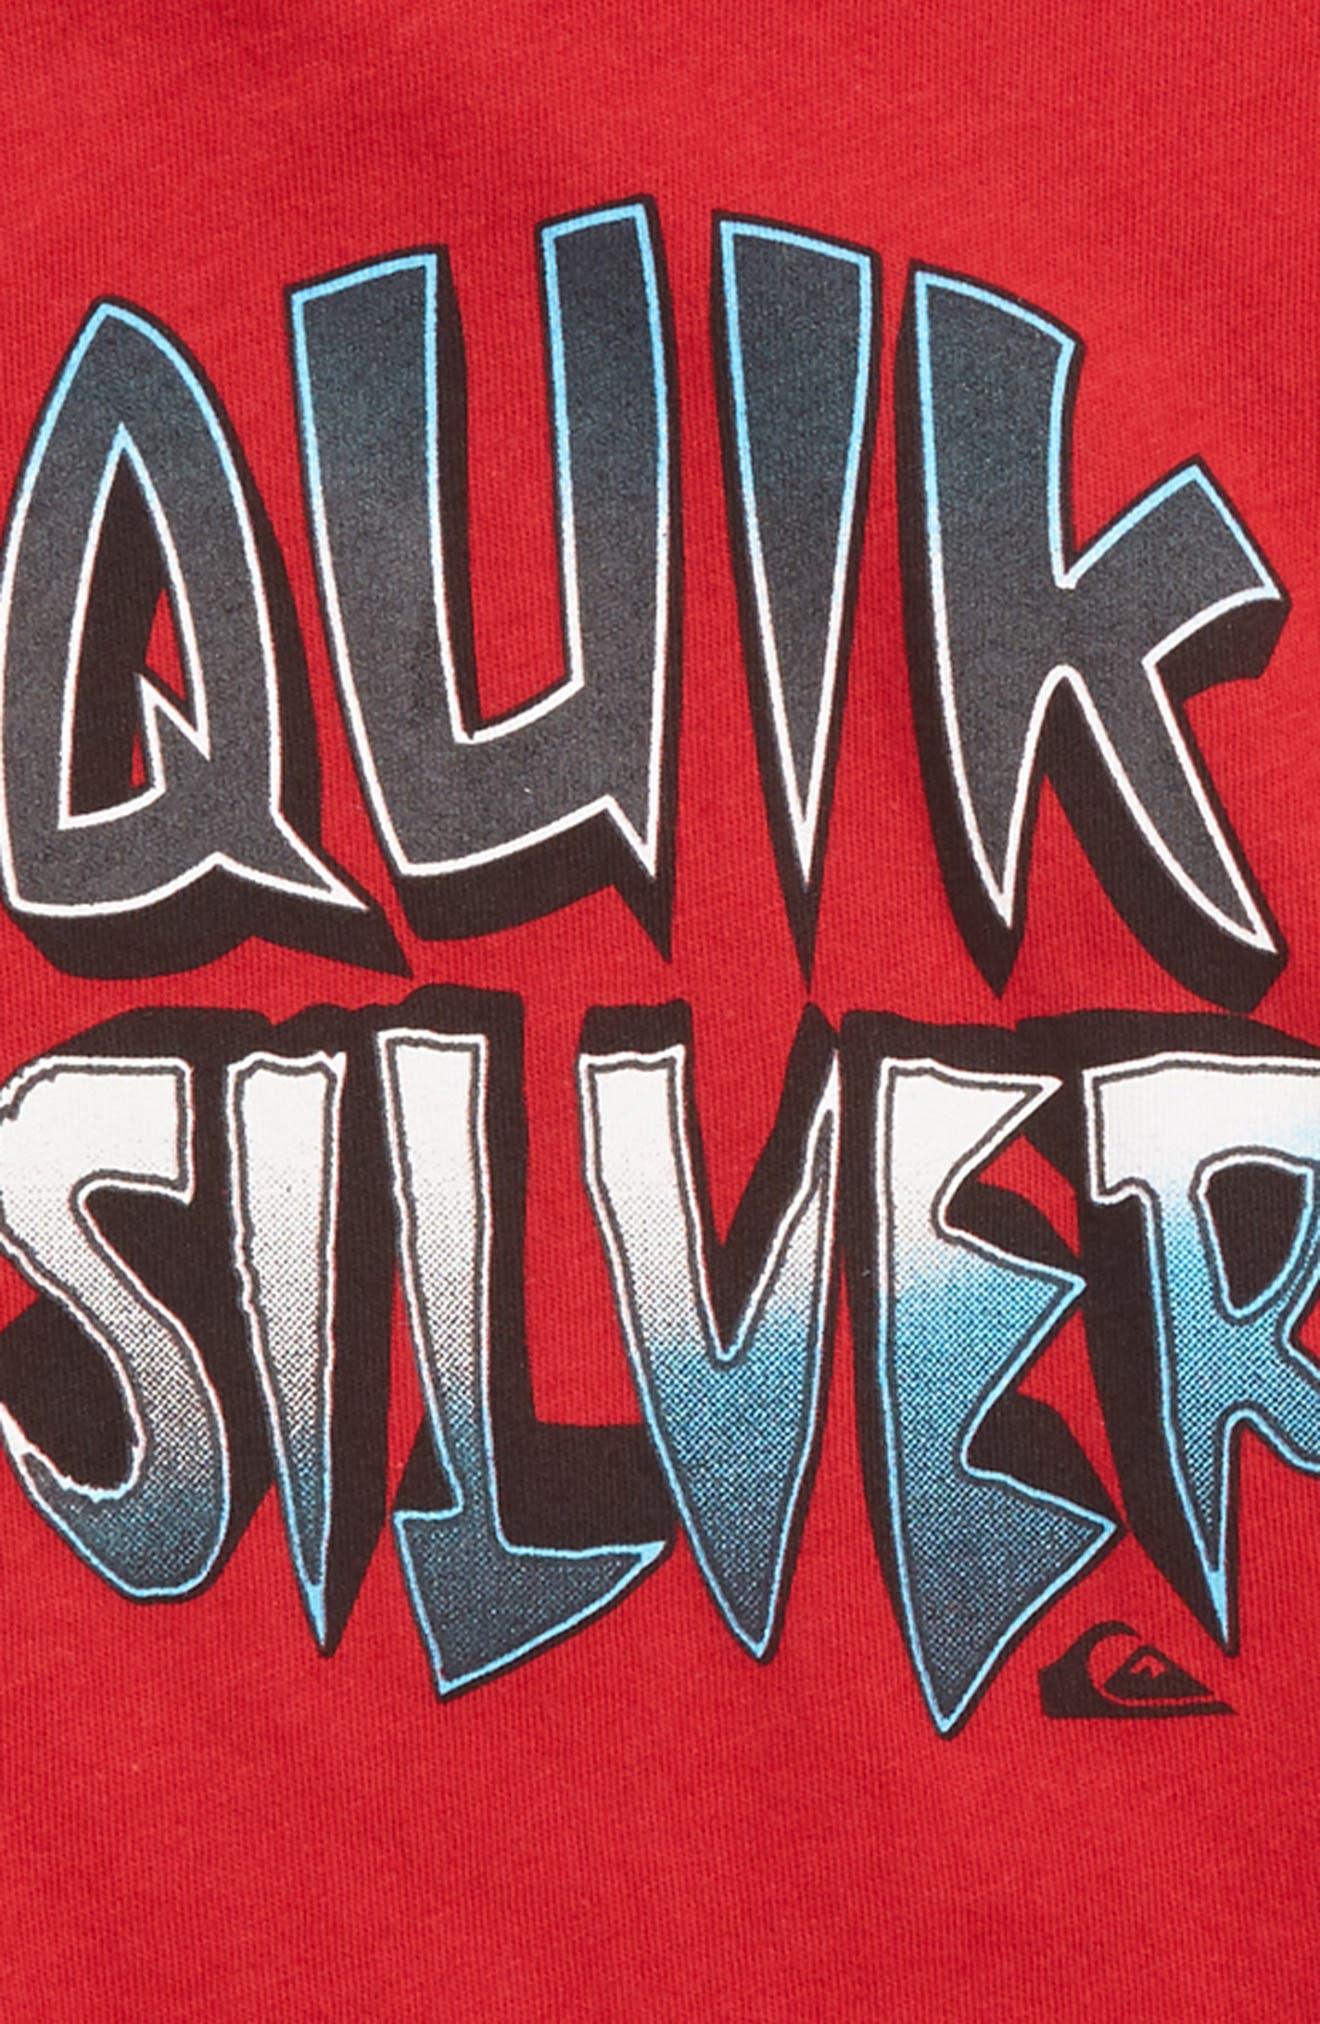 Capt Cavern Graphic T-Shirt,                             Alternate thumbnail 2, color,                             Chili Pepper